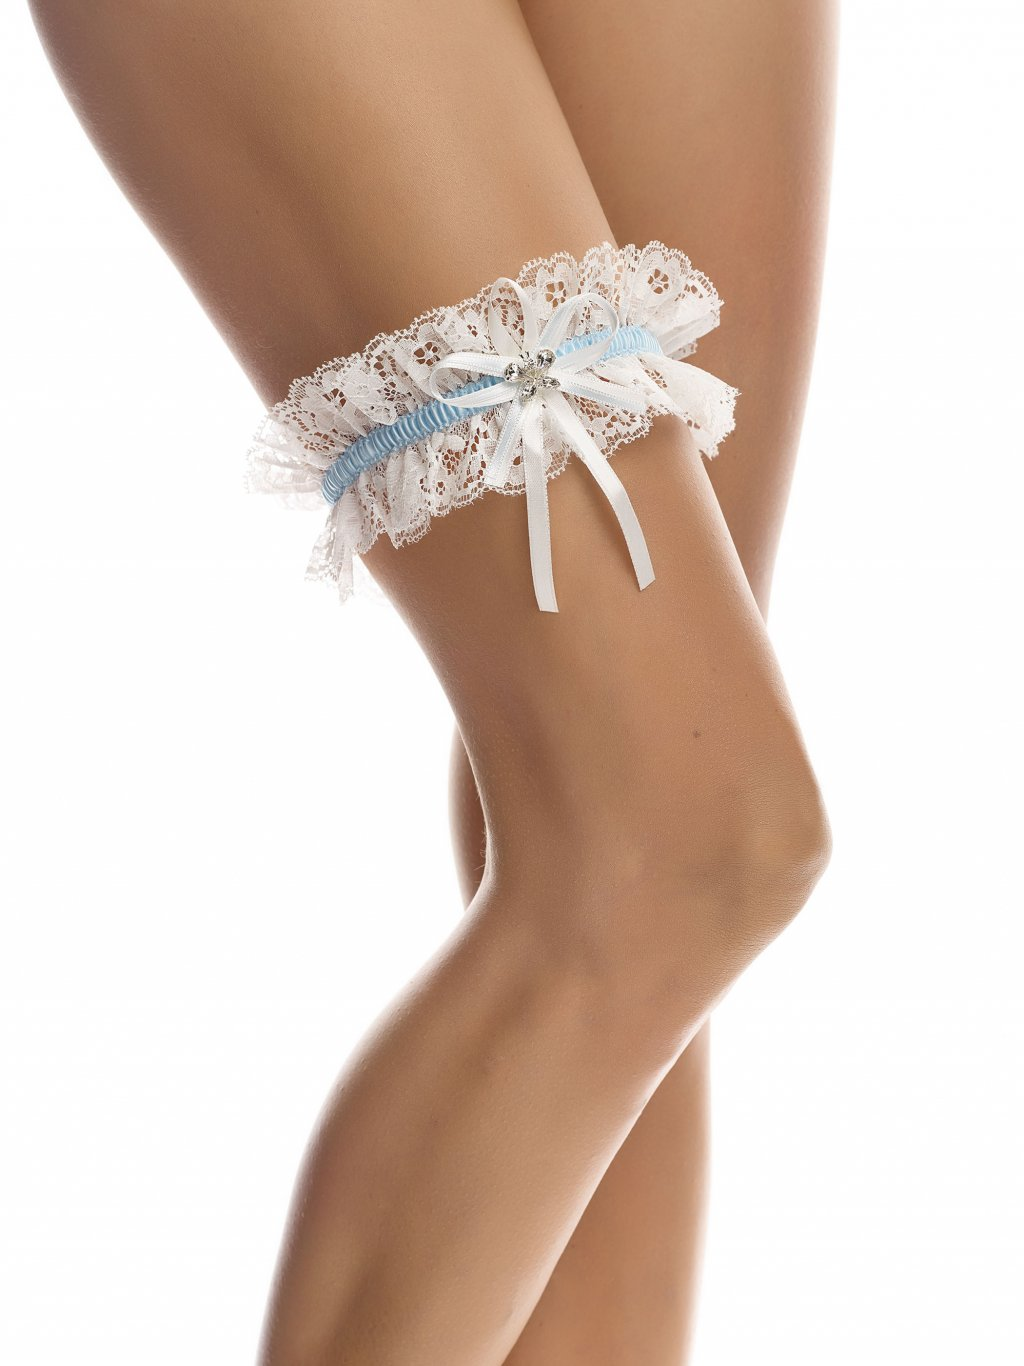 Studioagnes podvazek svatebni smetanovy s modrou stuhou Bianco Evento bridal garter SB3 (1)